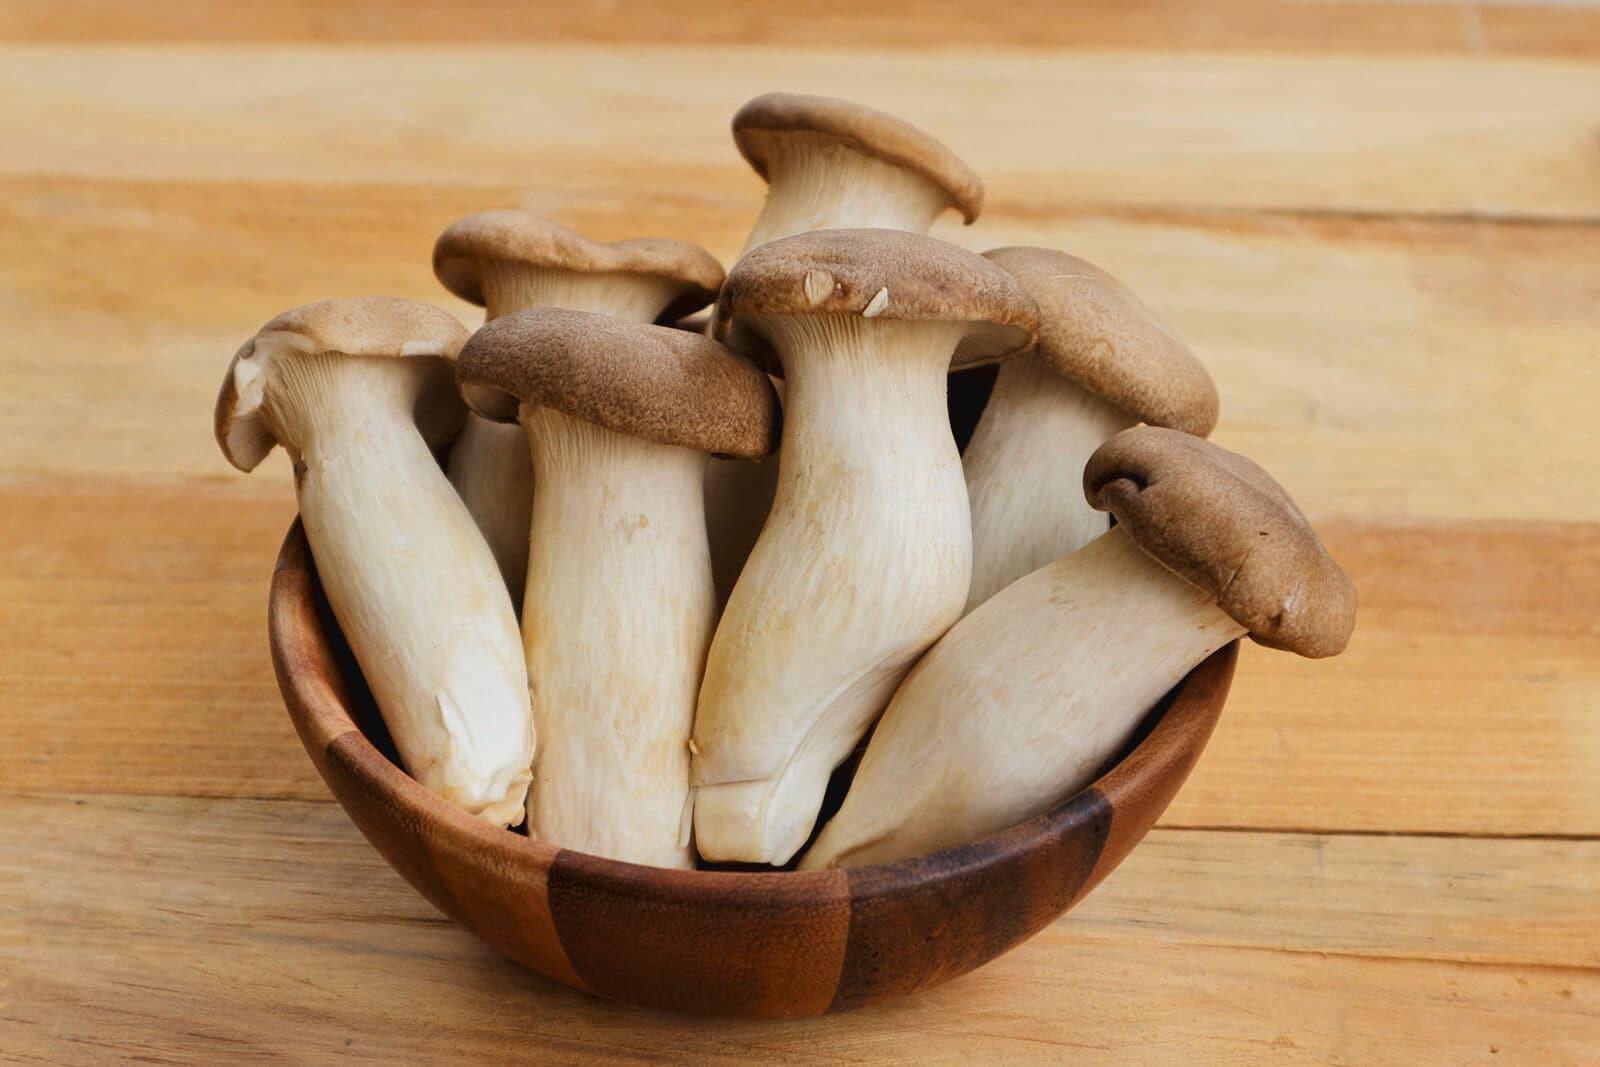 Satu mangkuk kayu berisi banyak jamur tiram